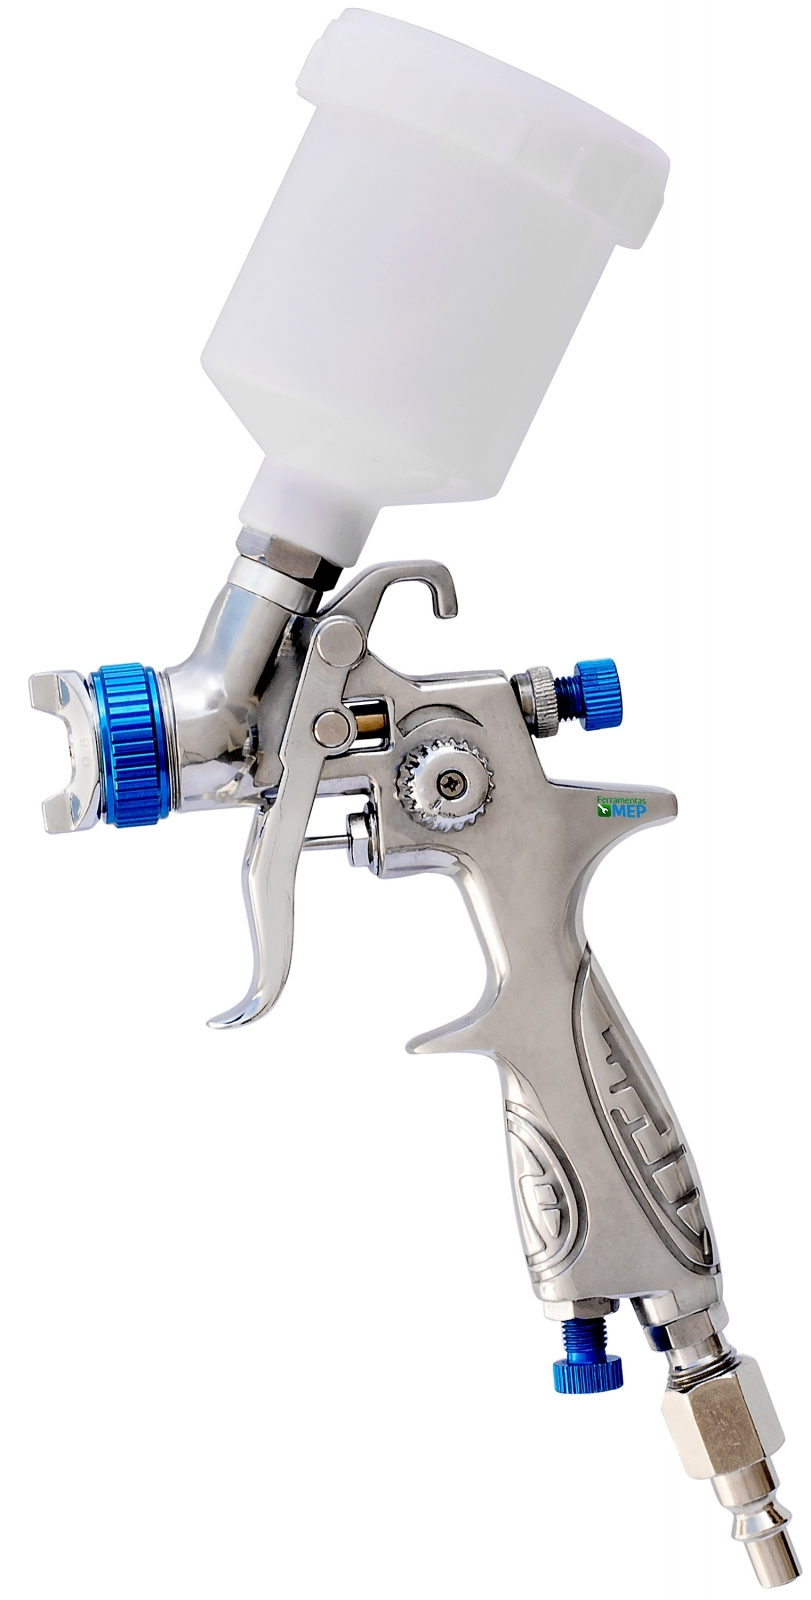 Pistola Retoque E Pintura Mini Hvlp Automotiva Ldr Pro 535 - Ferramentas MEP